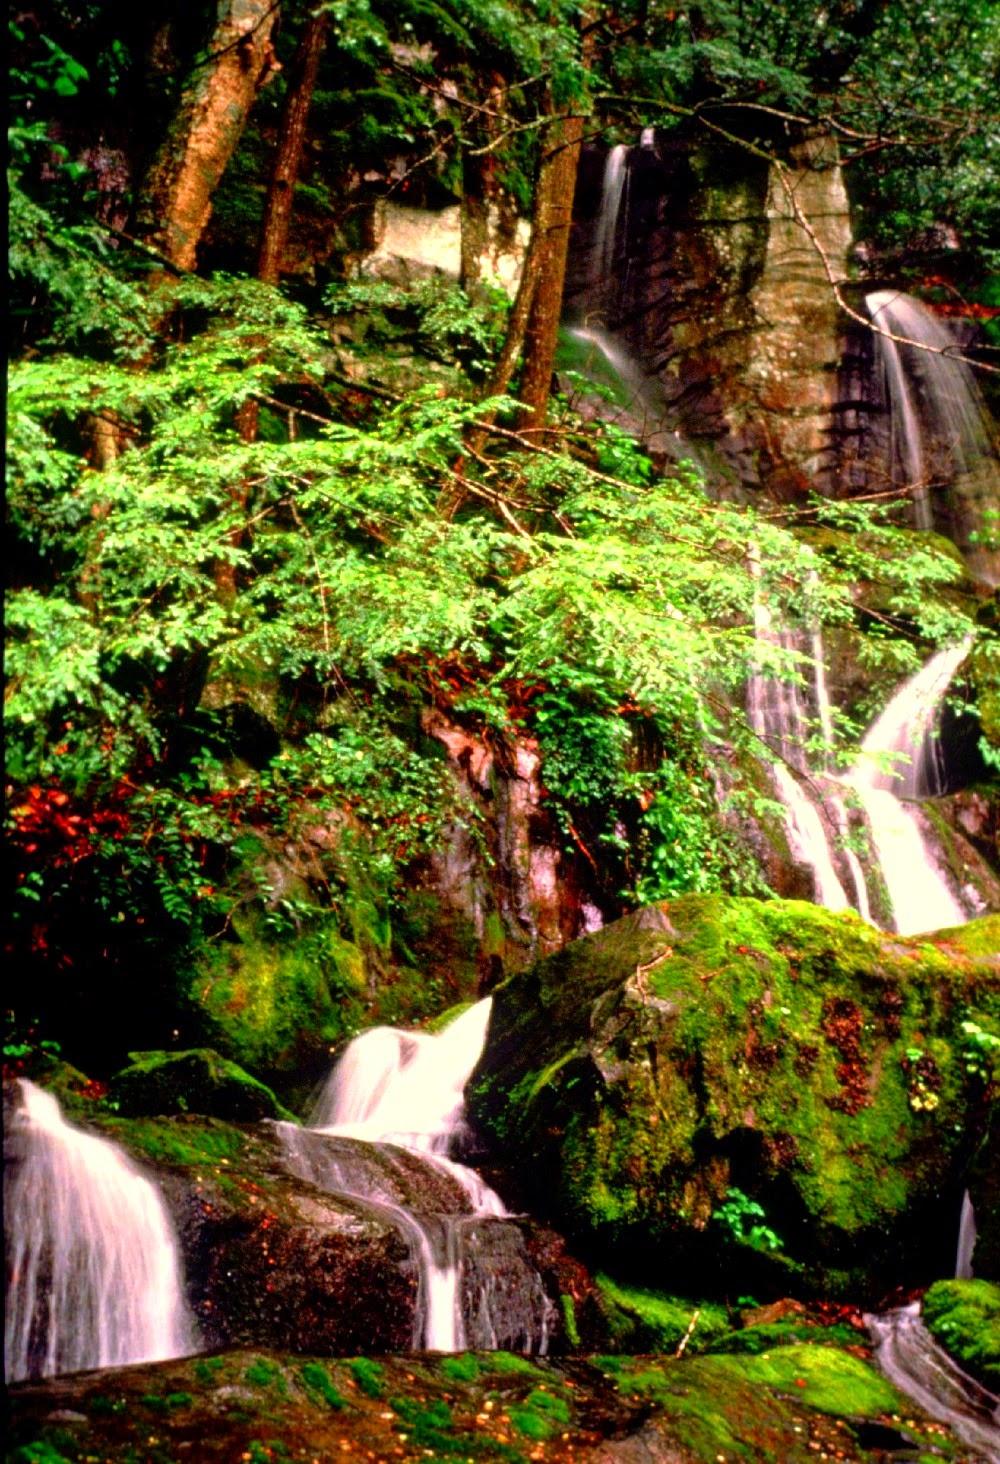 Smoky Mountain National Park (National Park Service photo)